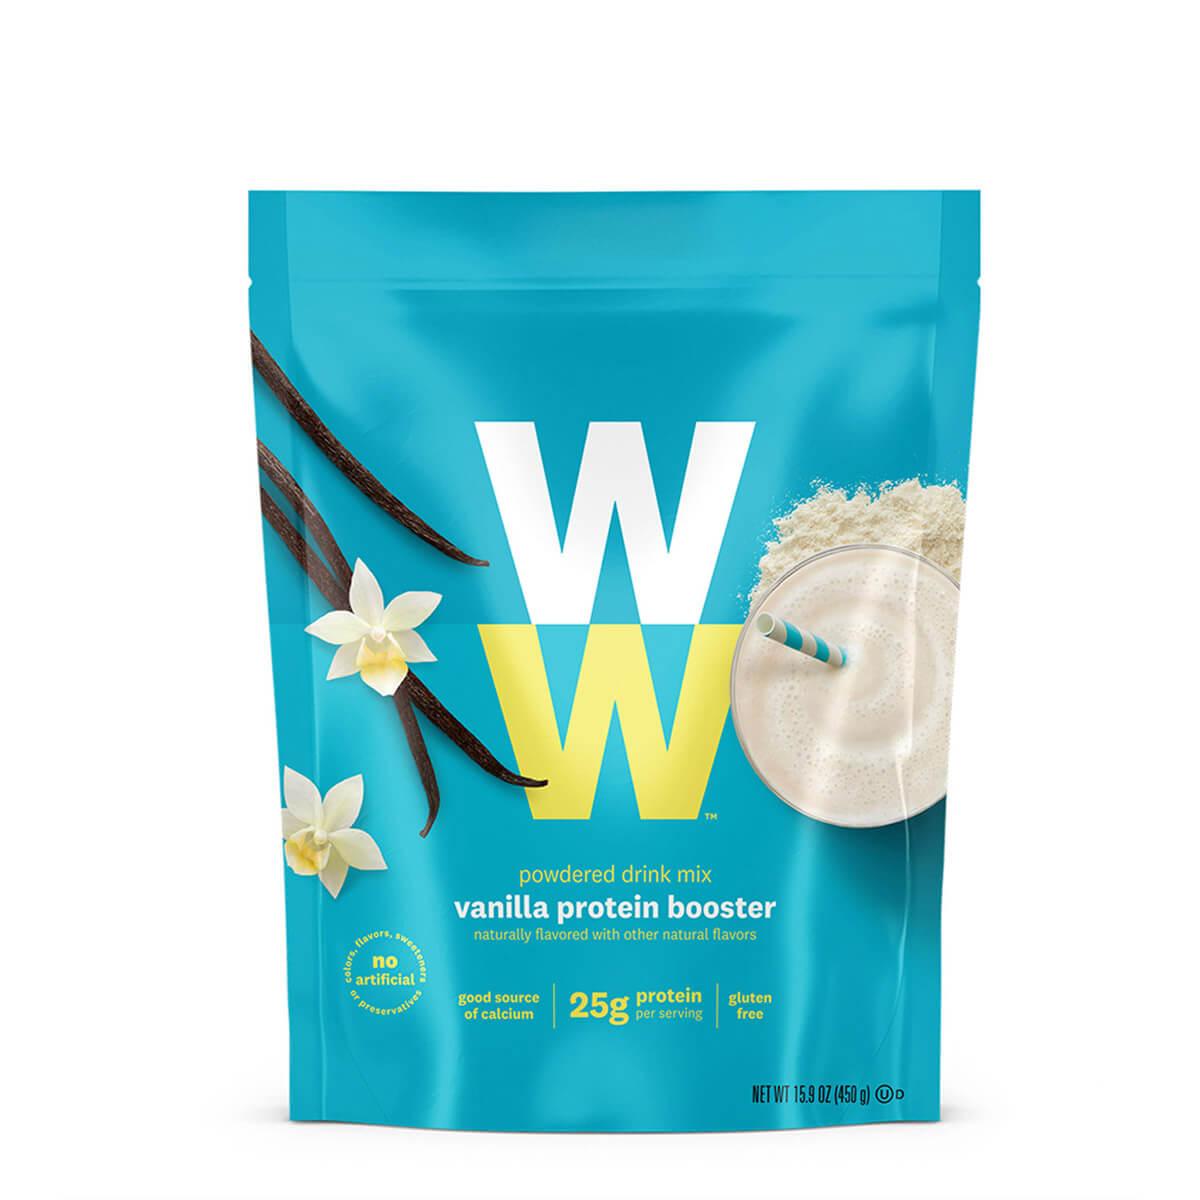 Vanilla Protein Booster, front of bag, 25g of protein, powdered drink mix, gluten free